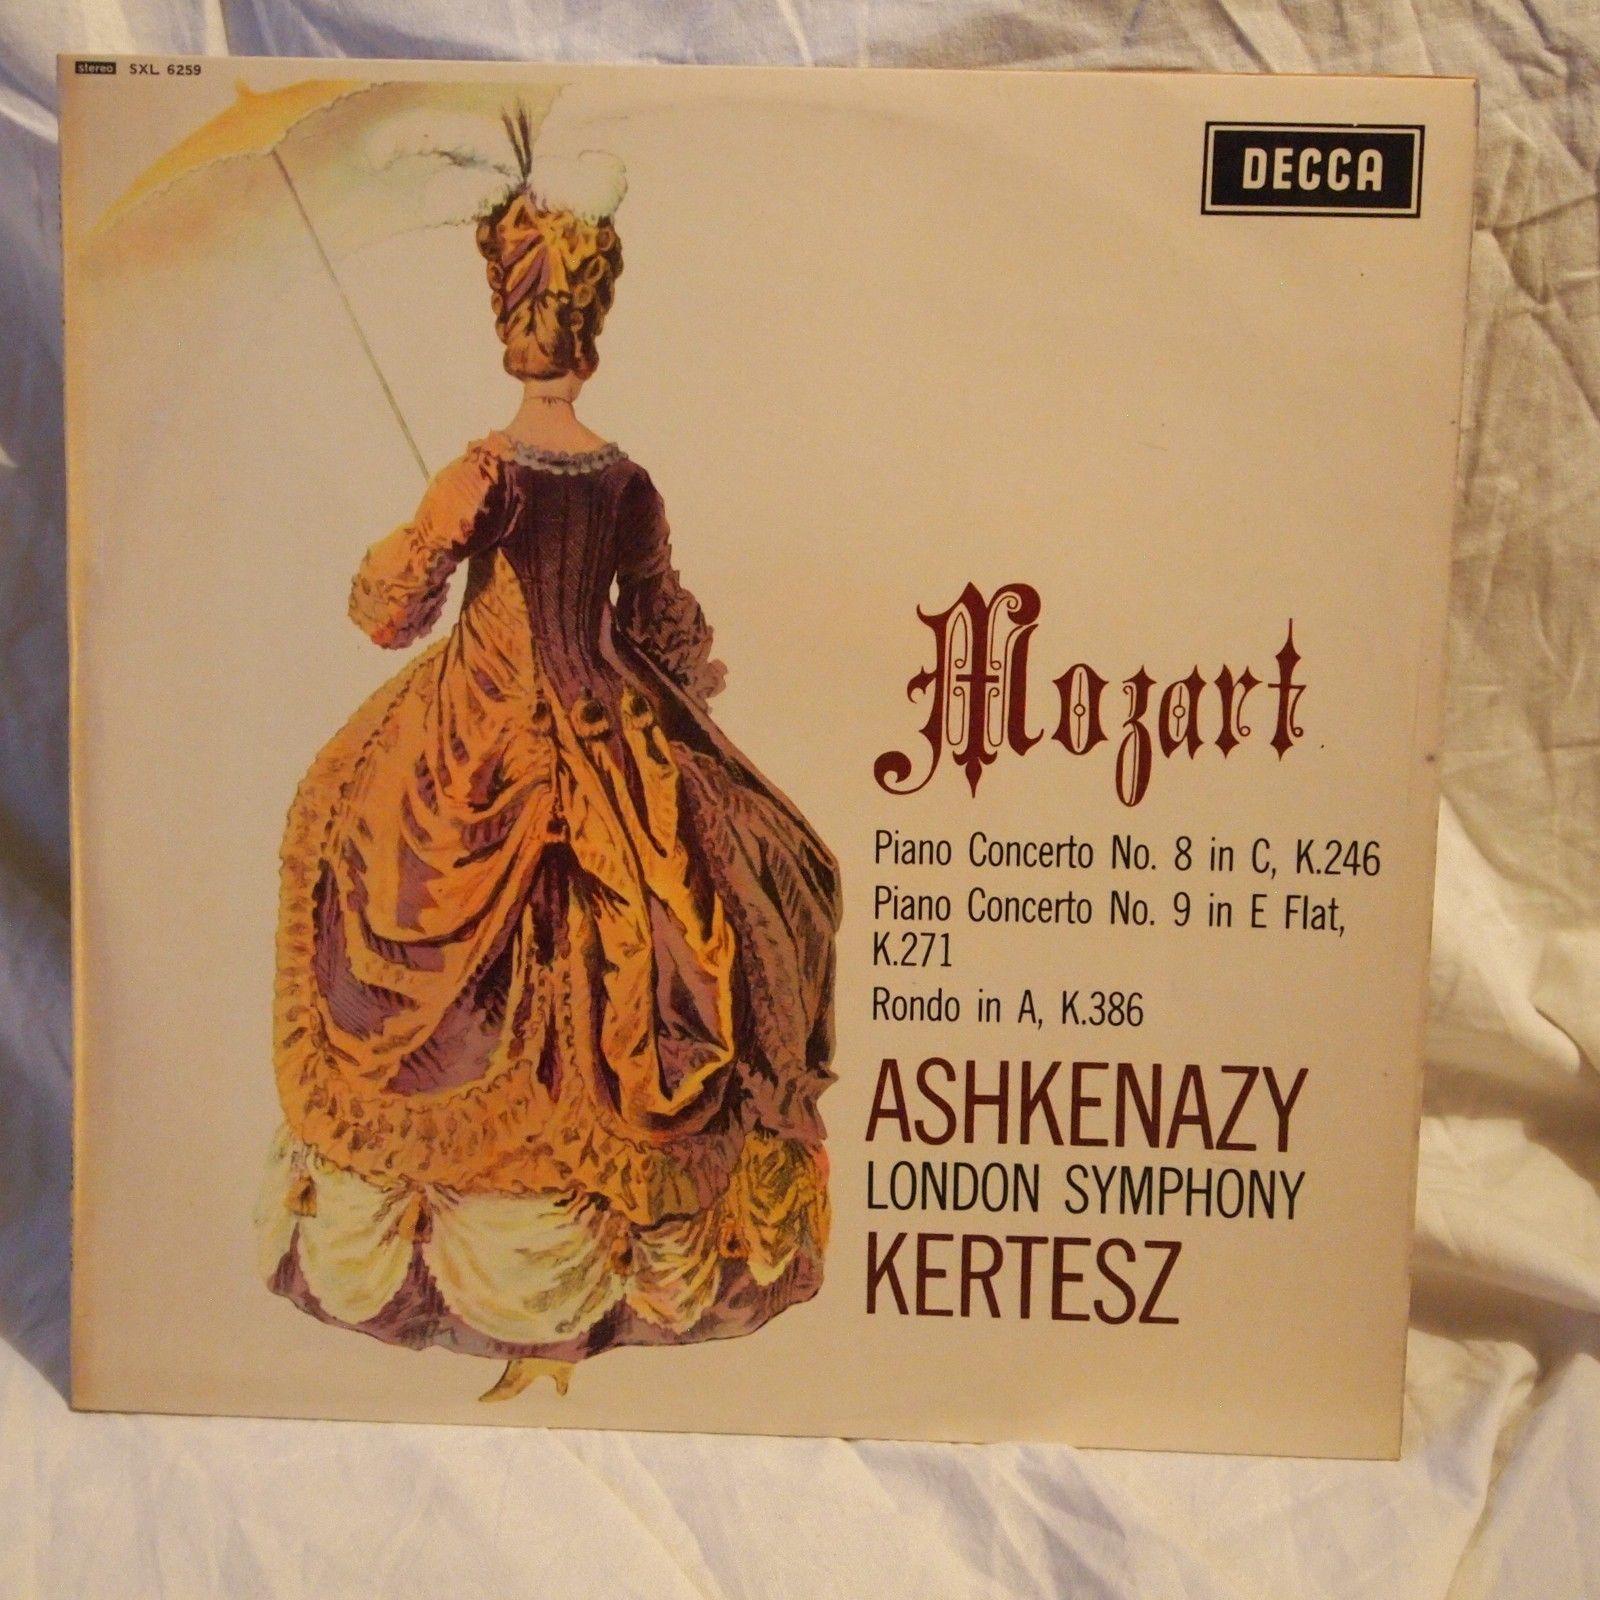 DECCA SXL 6259 KERTESZ & ASHKENAZY Mozart Piano Concert 8 & 9 ORIGINAL Wbg UK NM